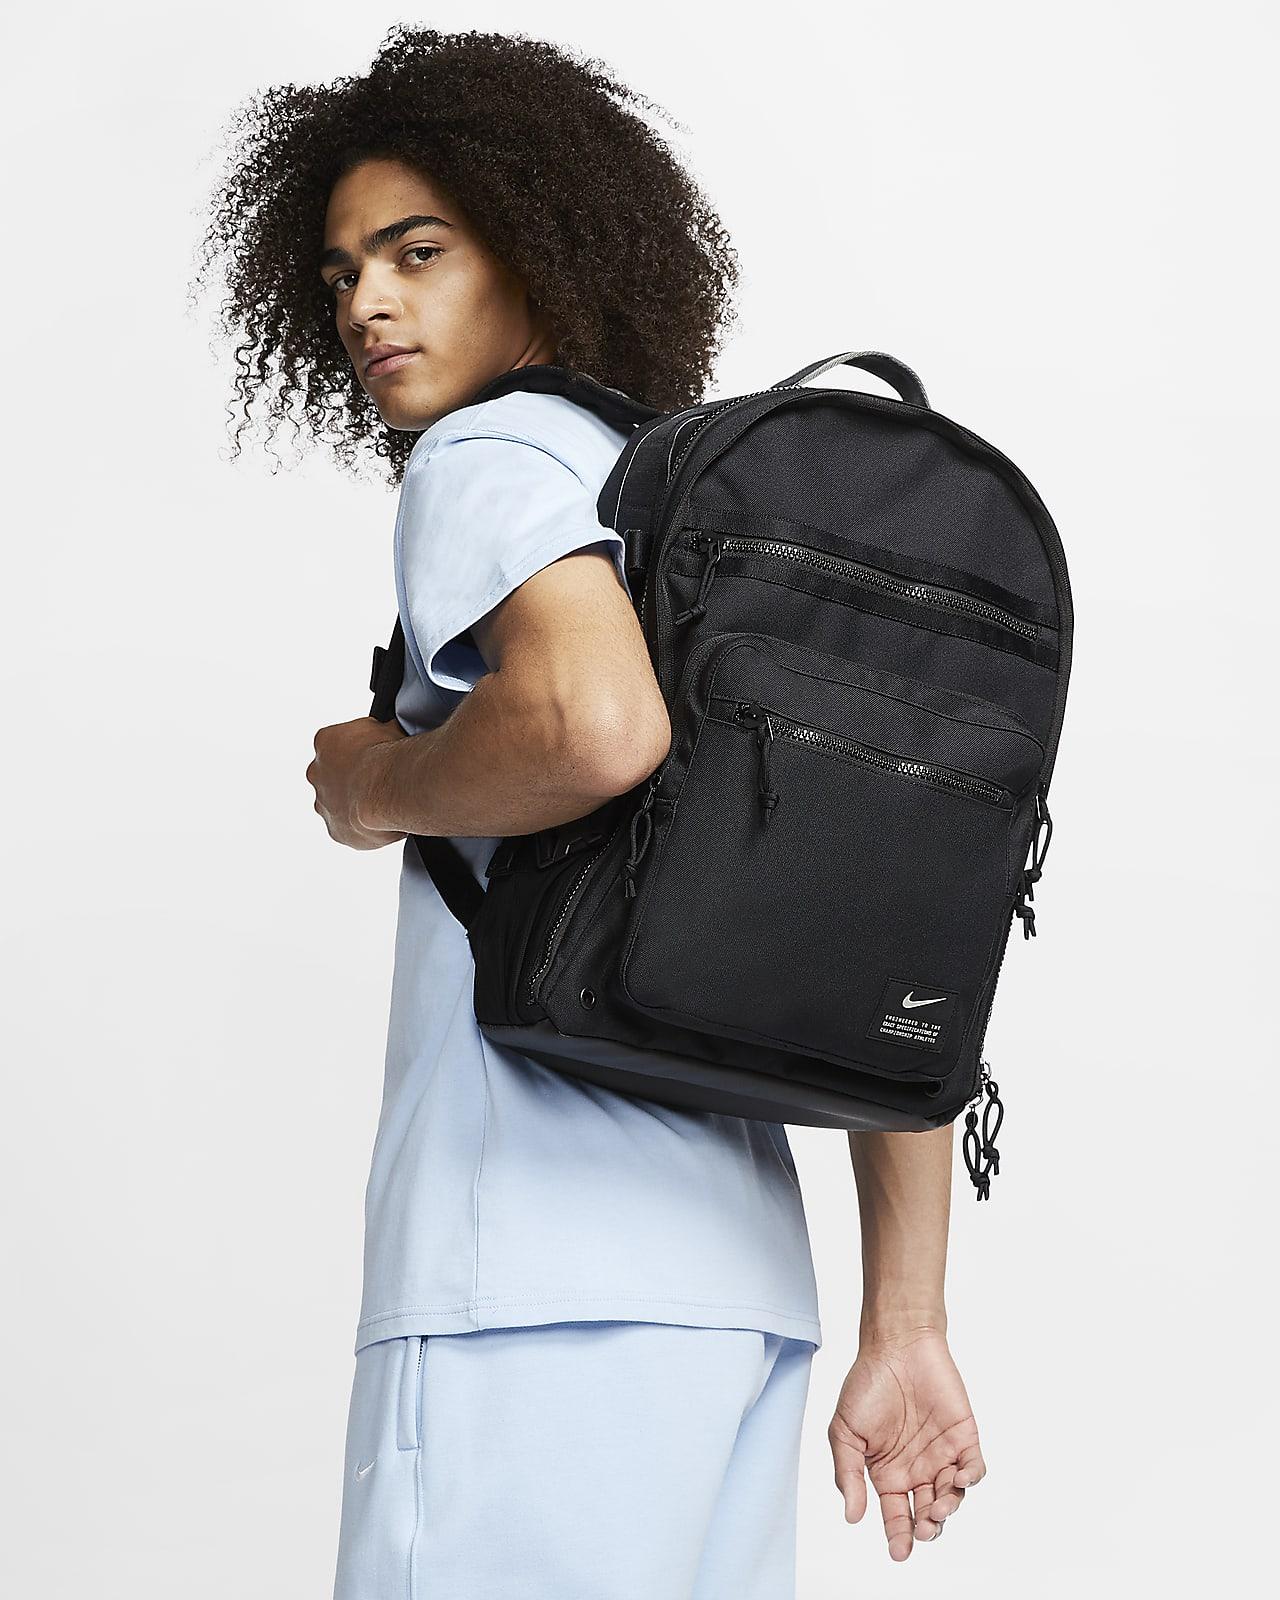 Рюкзак для тренинга Nike Utility Power